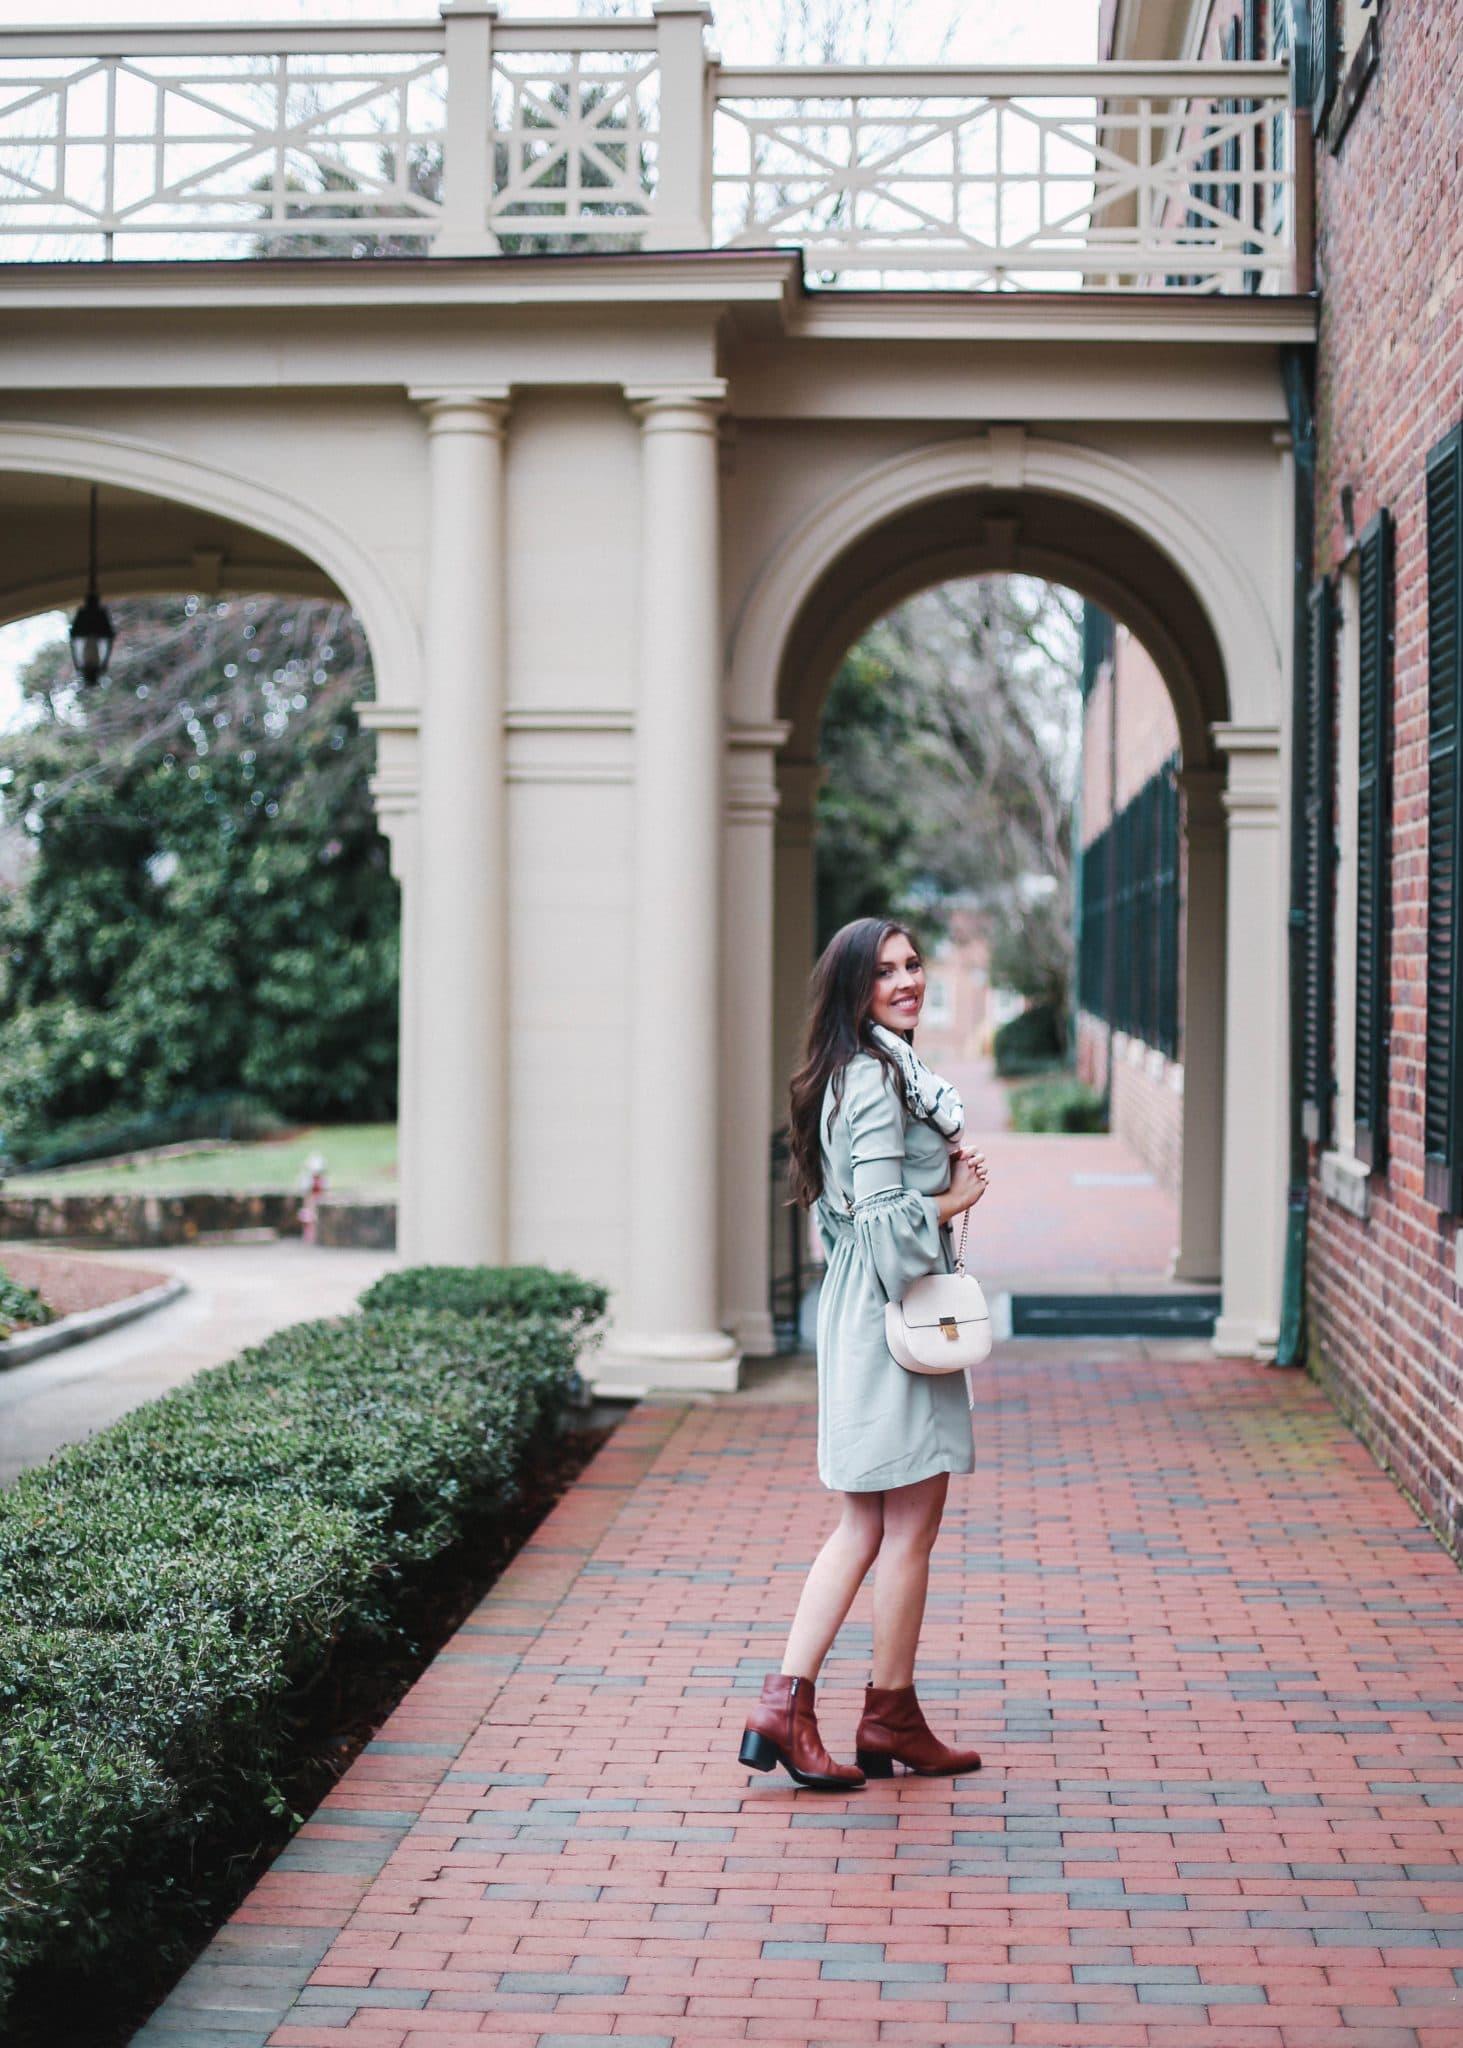 The Carolina Inn, Chapel Hill hotel, chapel hill wedding venue, pretty in the pines blog, north carolina fashion lifestyle blog